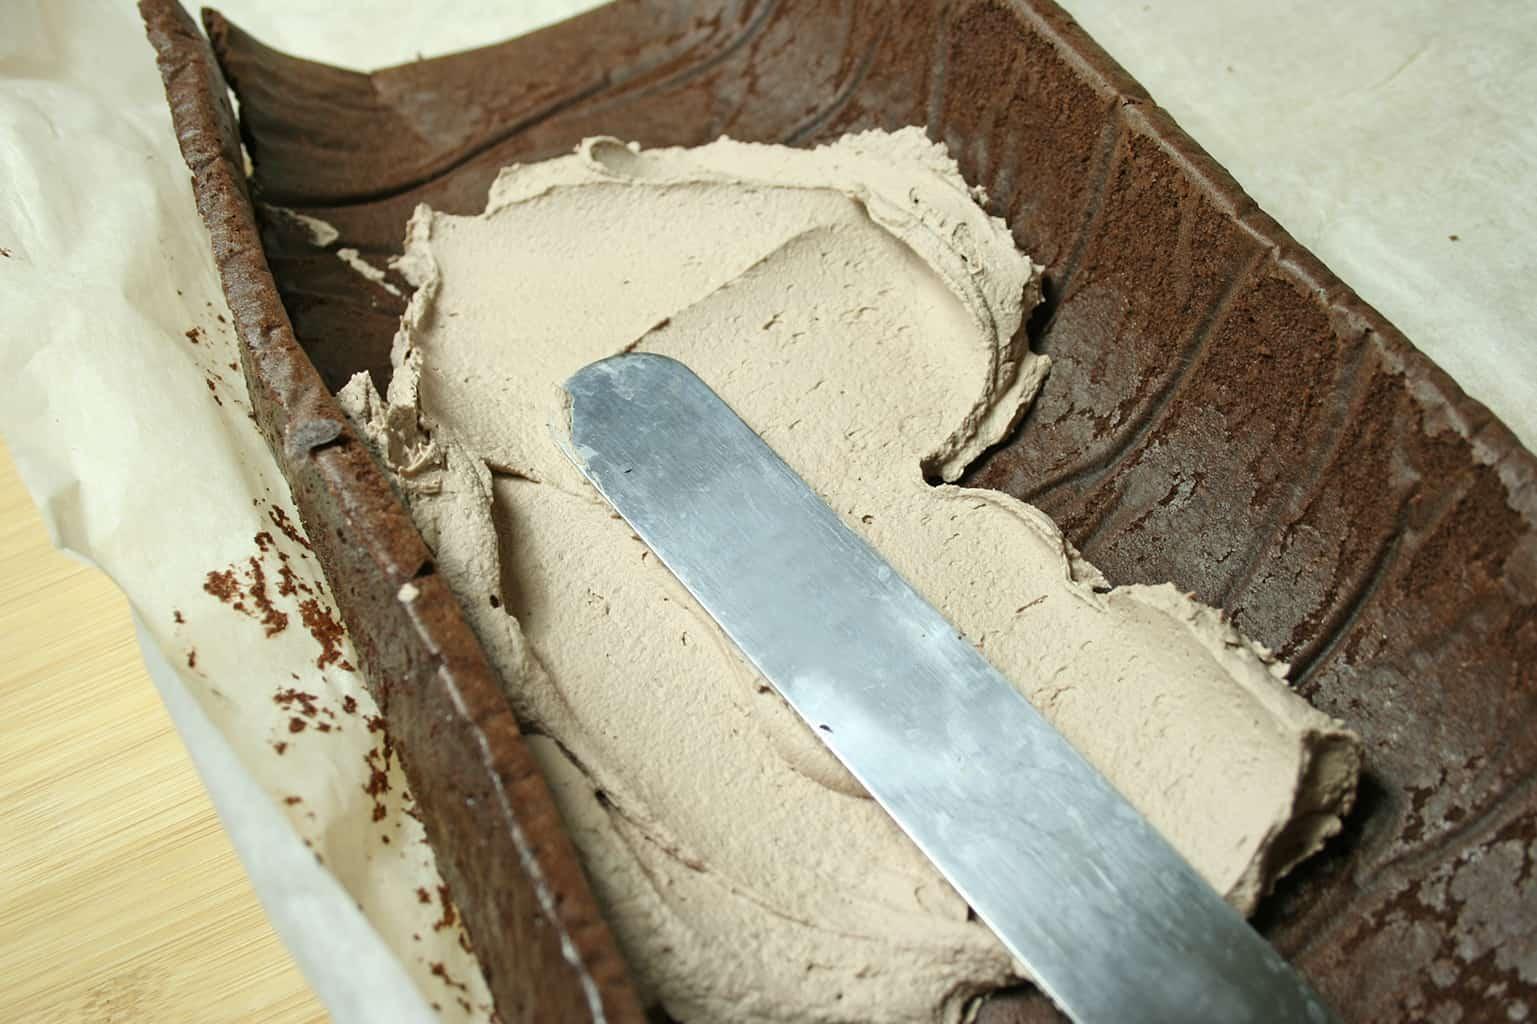 cream put on cake